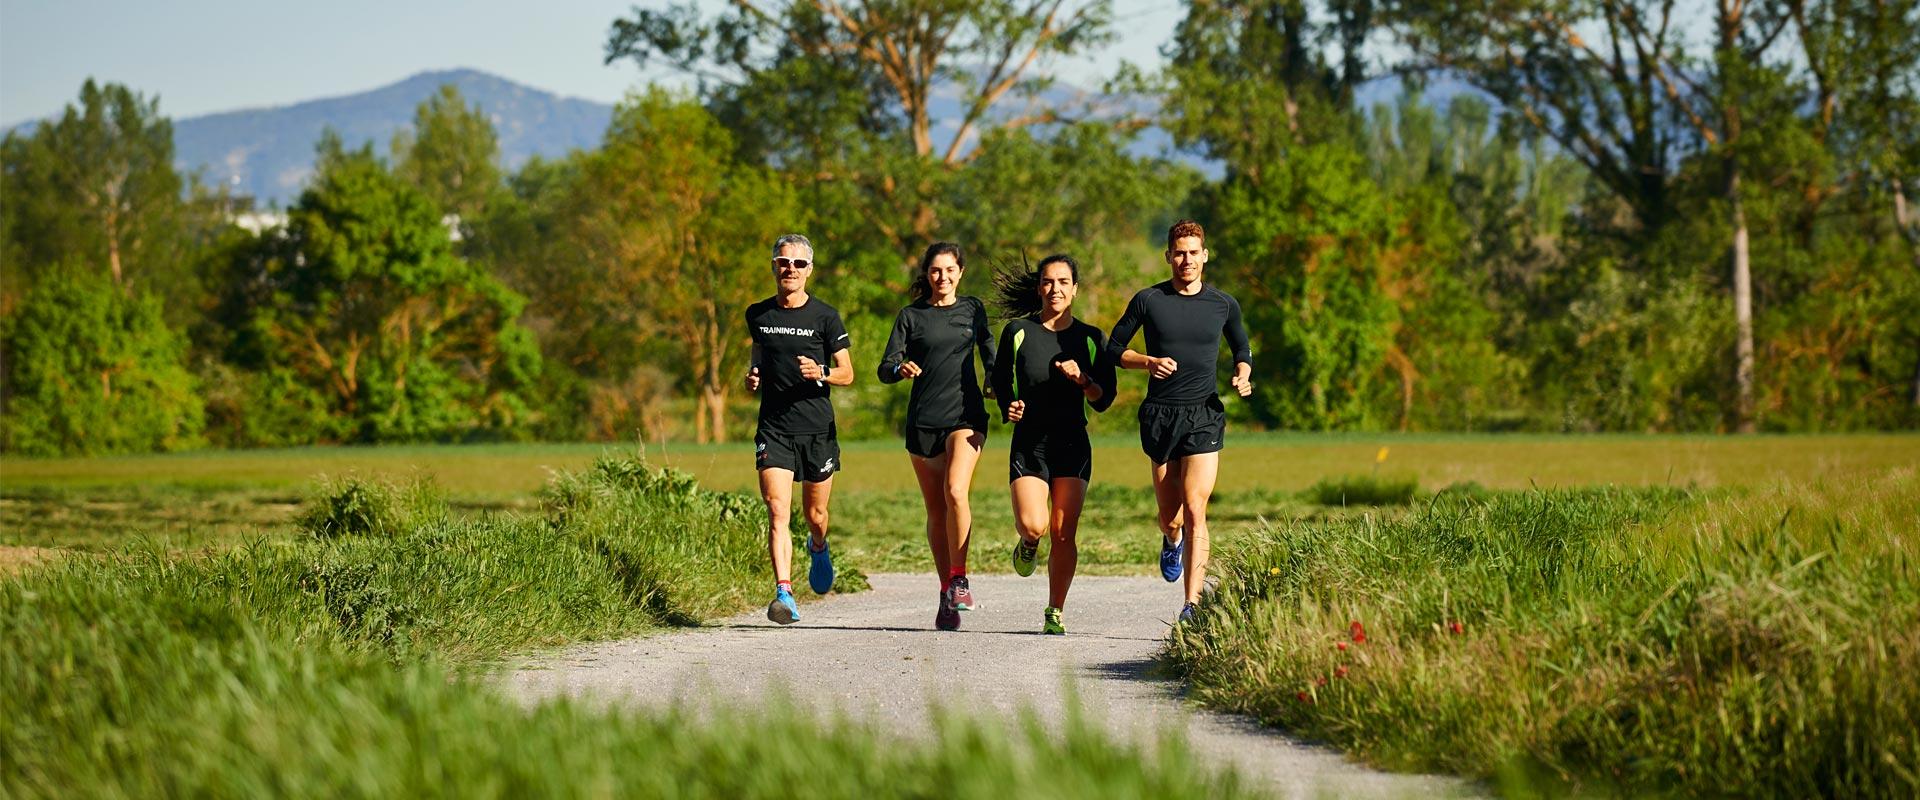 running in green lands